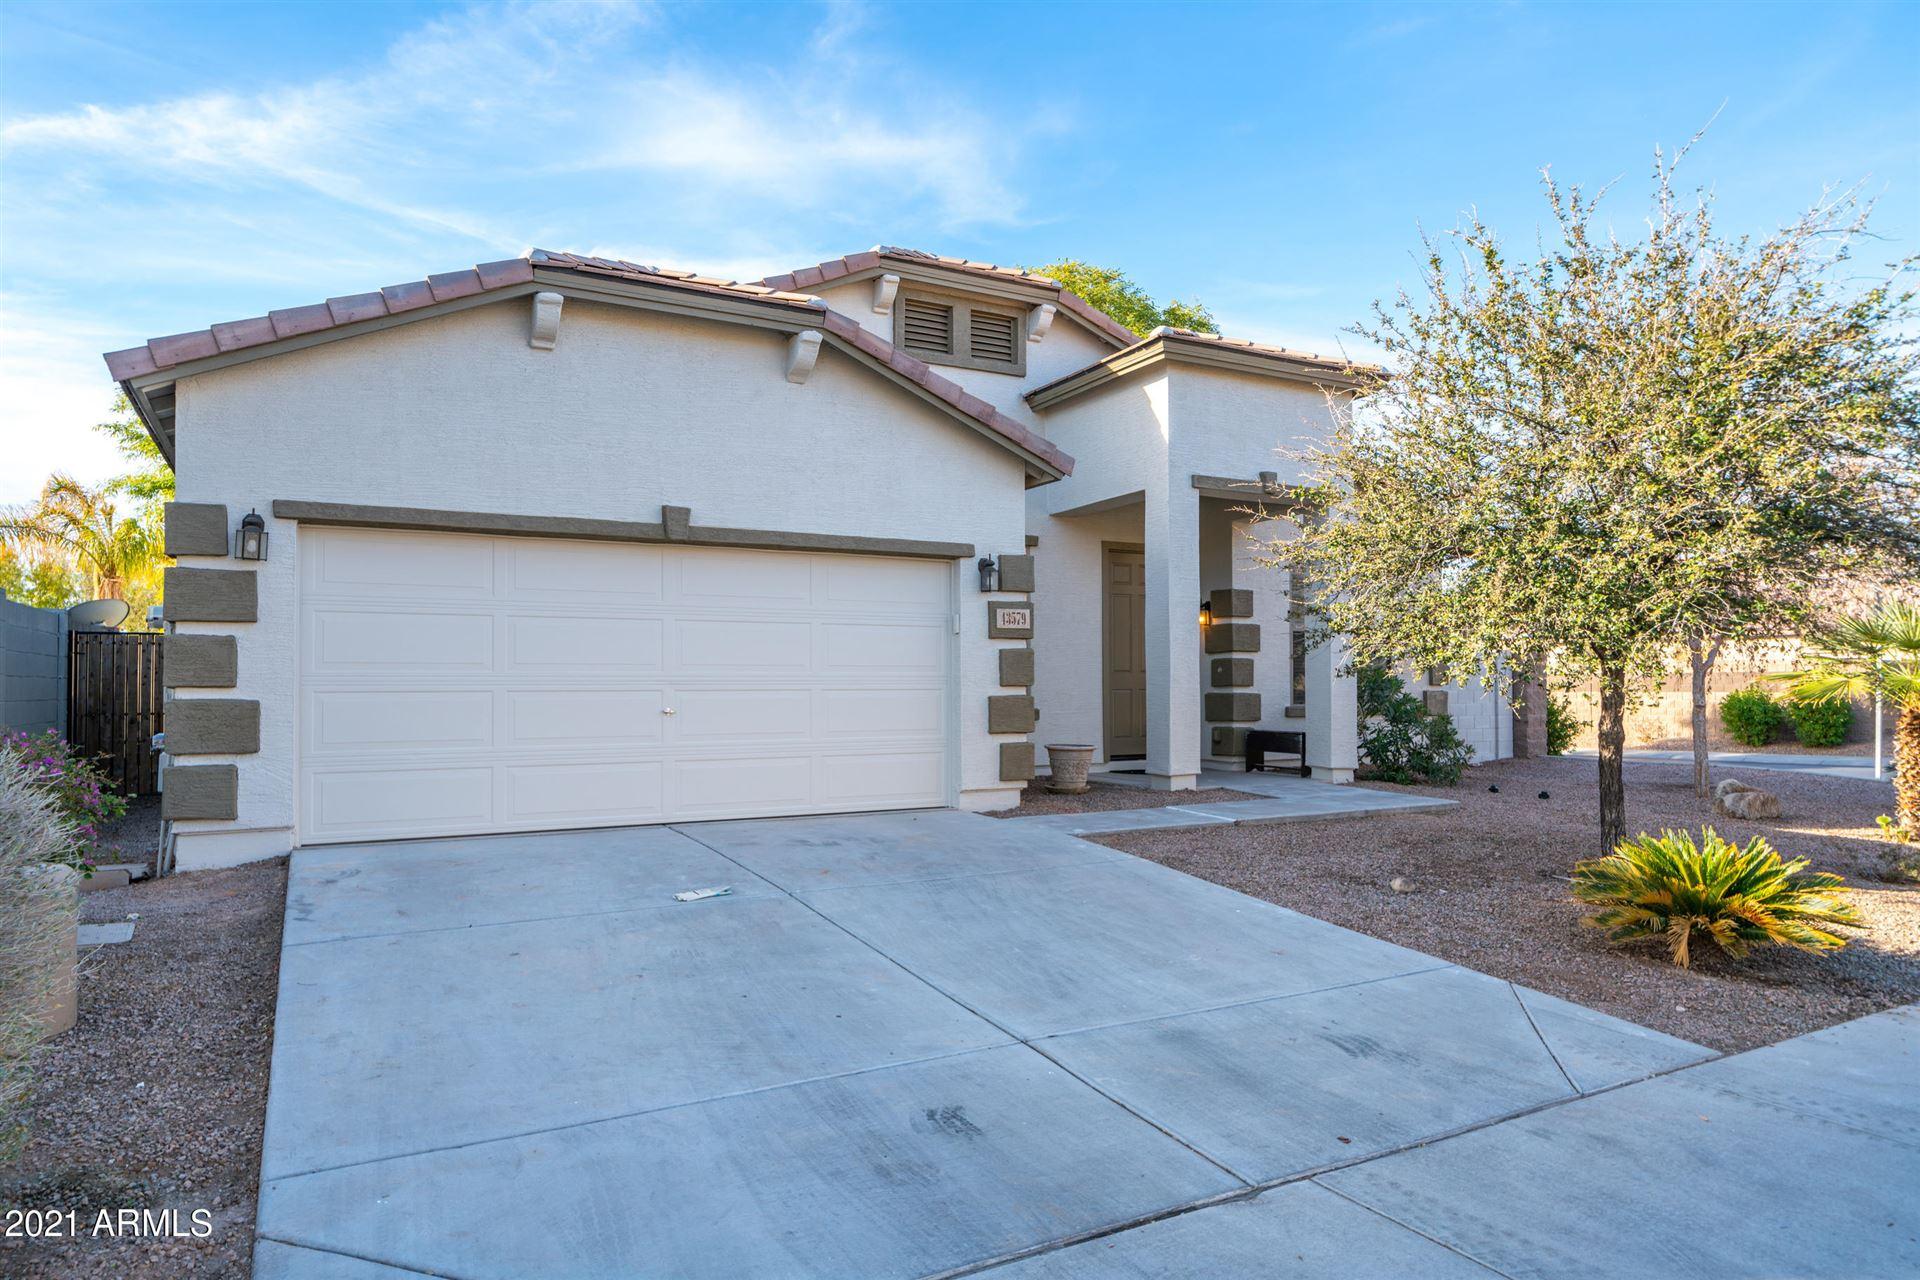 43579 W SANSOM Drive, Maricopa, AZ 85138 - MLS#: 6175359